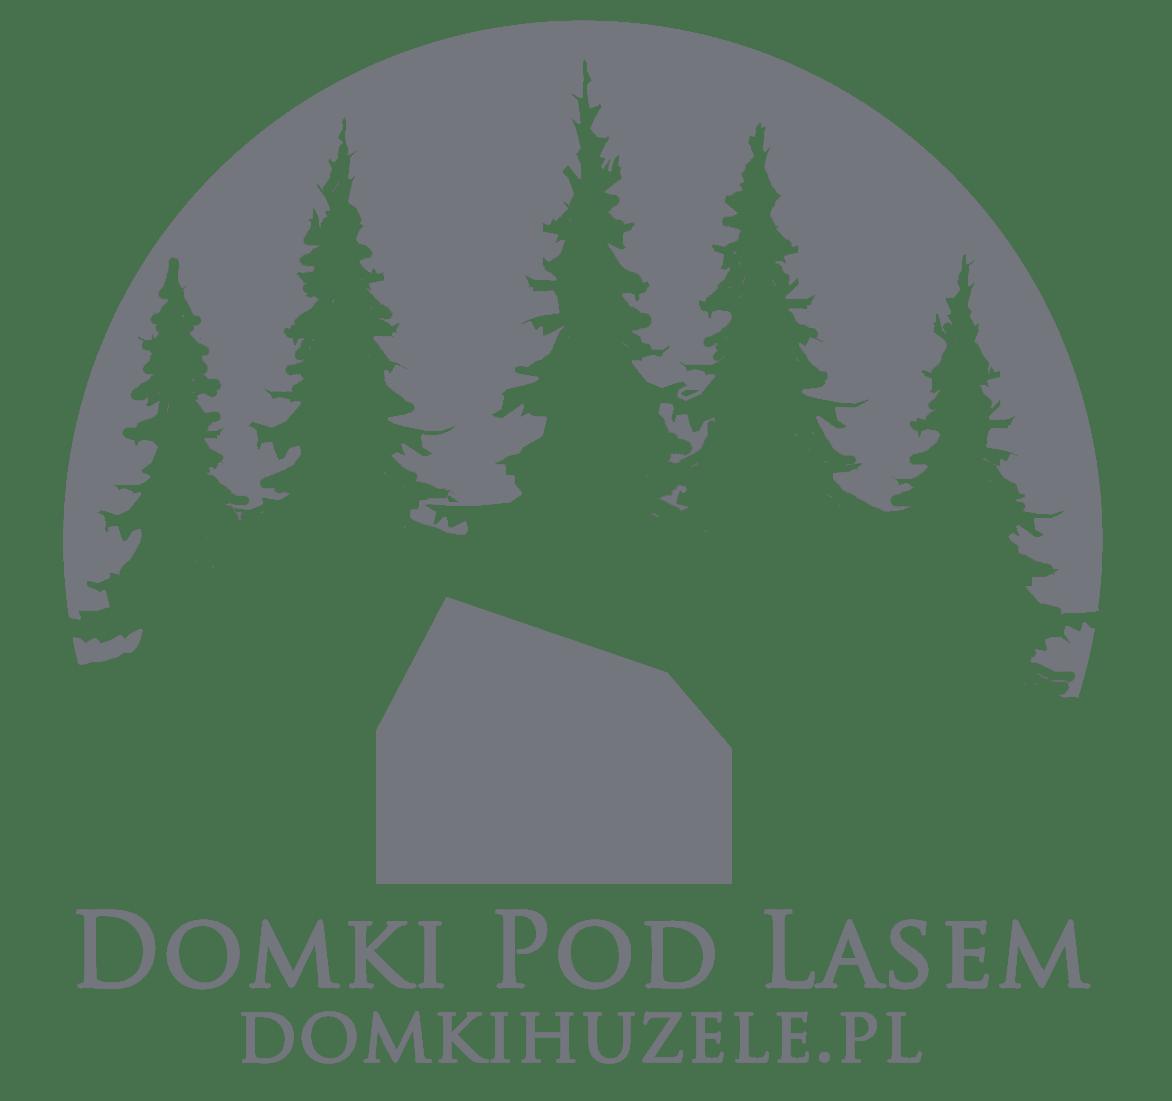 Domki Pod Lasem | domkihuzele.pl